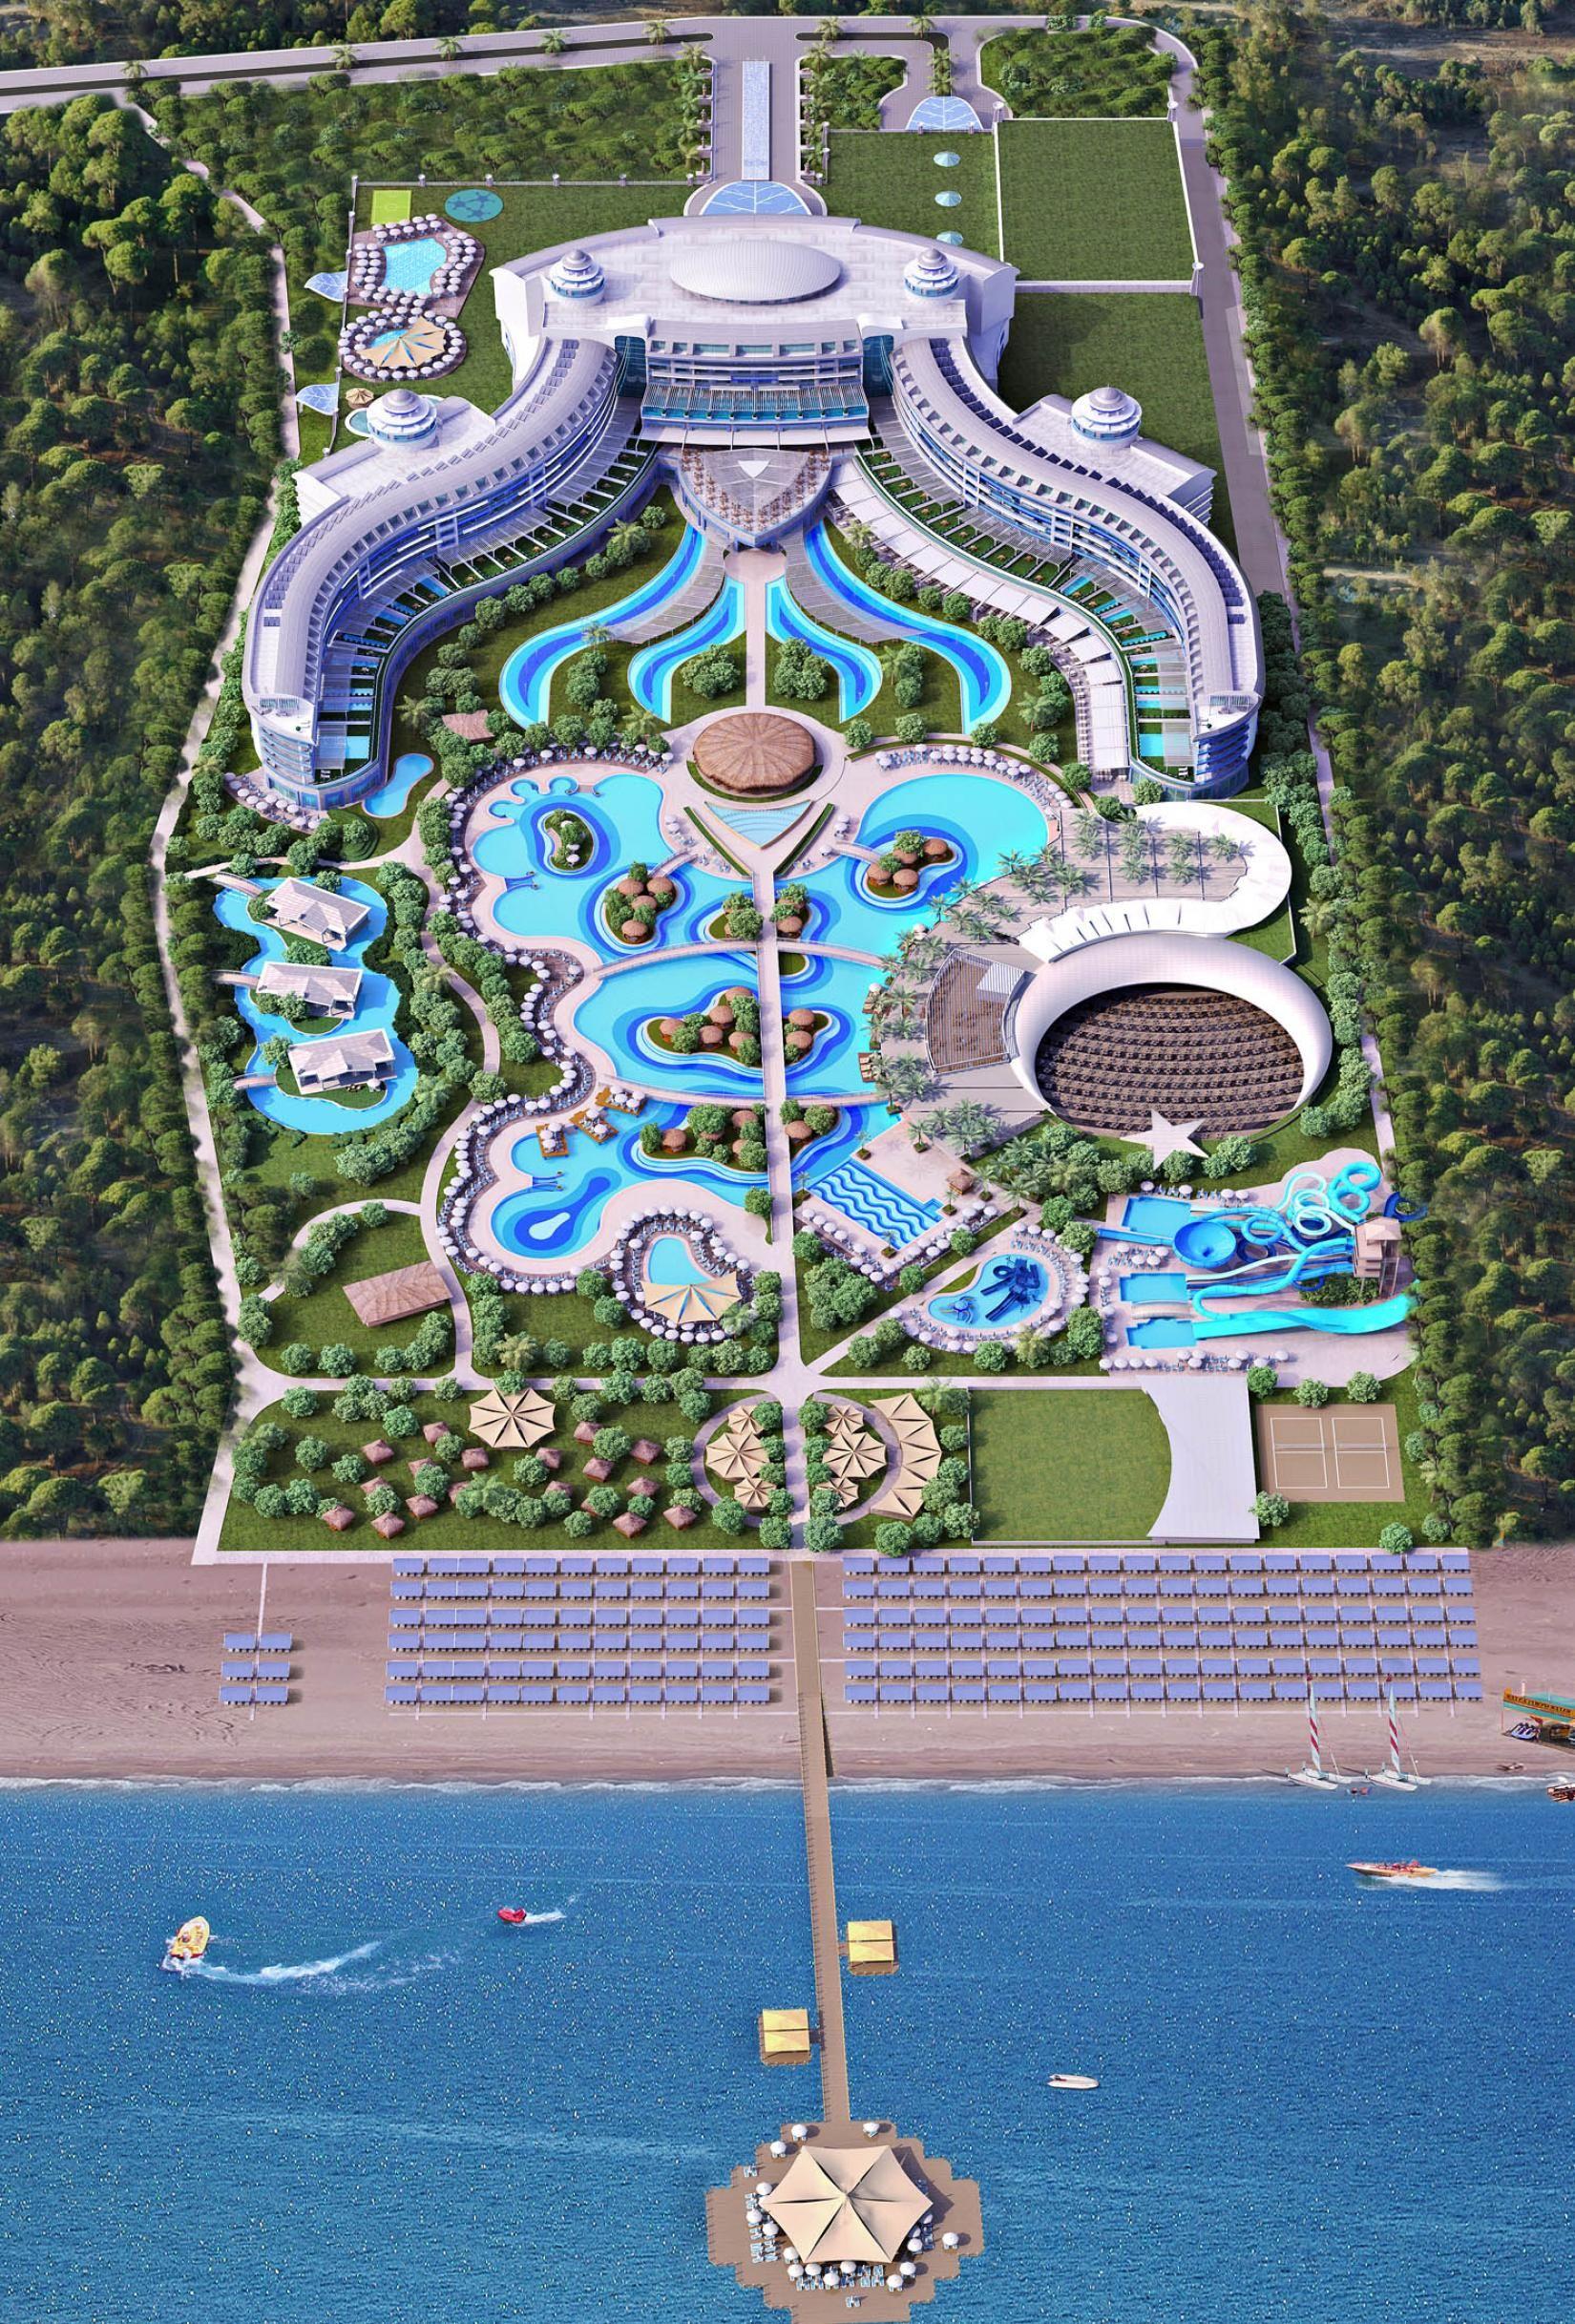 Https Visitantalya Com Sueno Hotels Deluxe Golf Belek 7 Nights 2x Golf Sueno Dunes Or Pi Resort Architecture Resort Design Plan Landscape Architecture Design